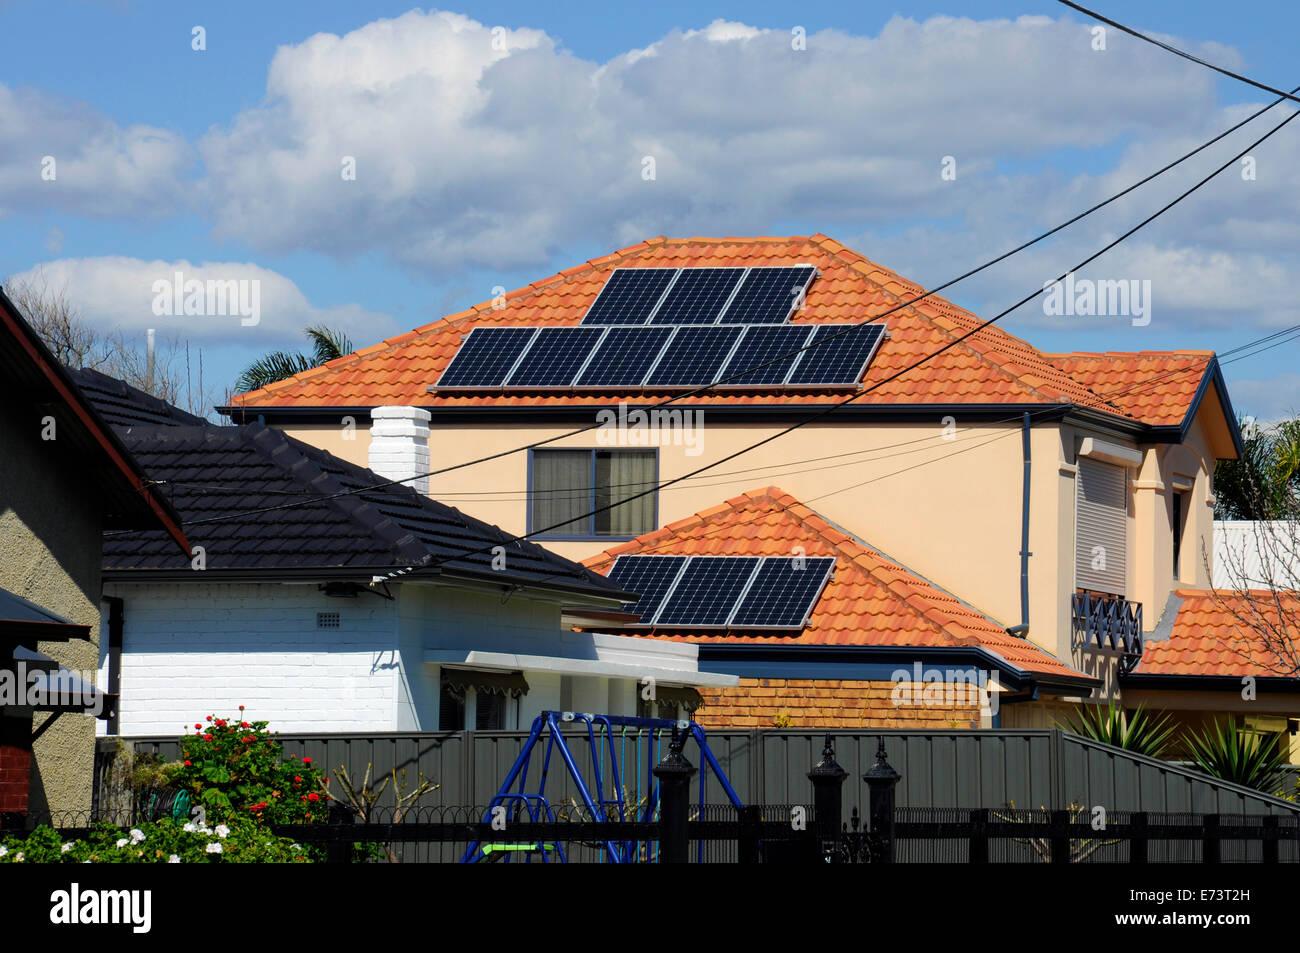 Australian photovoltaic solar power panels on suburban house roof top. - Stock Image